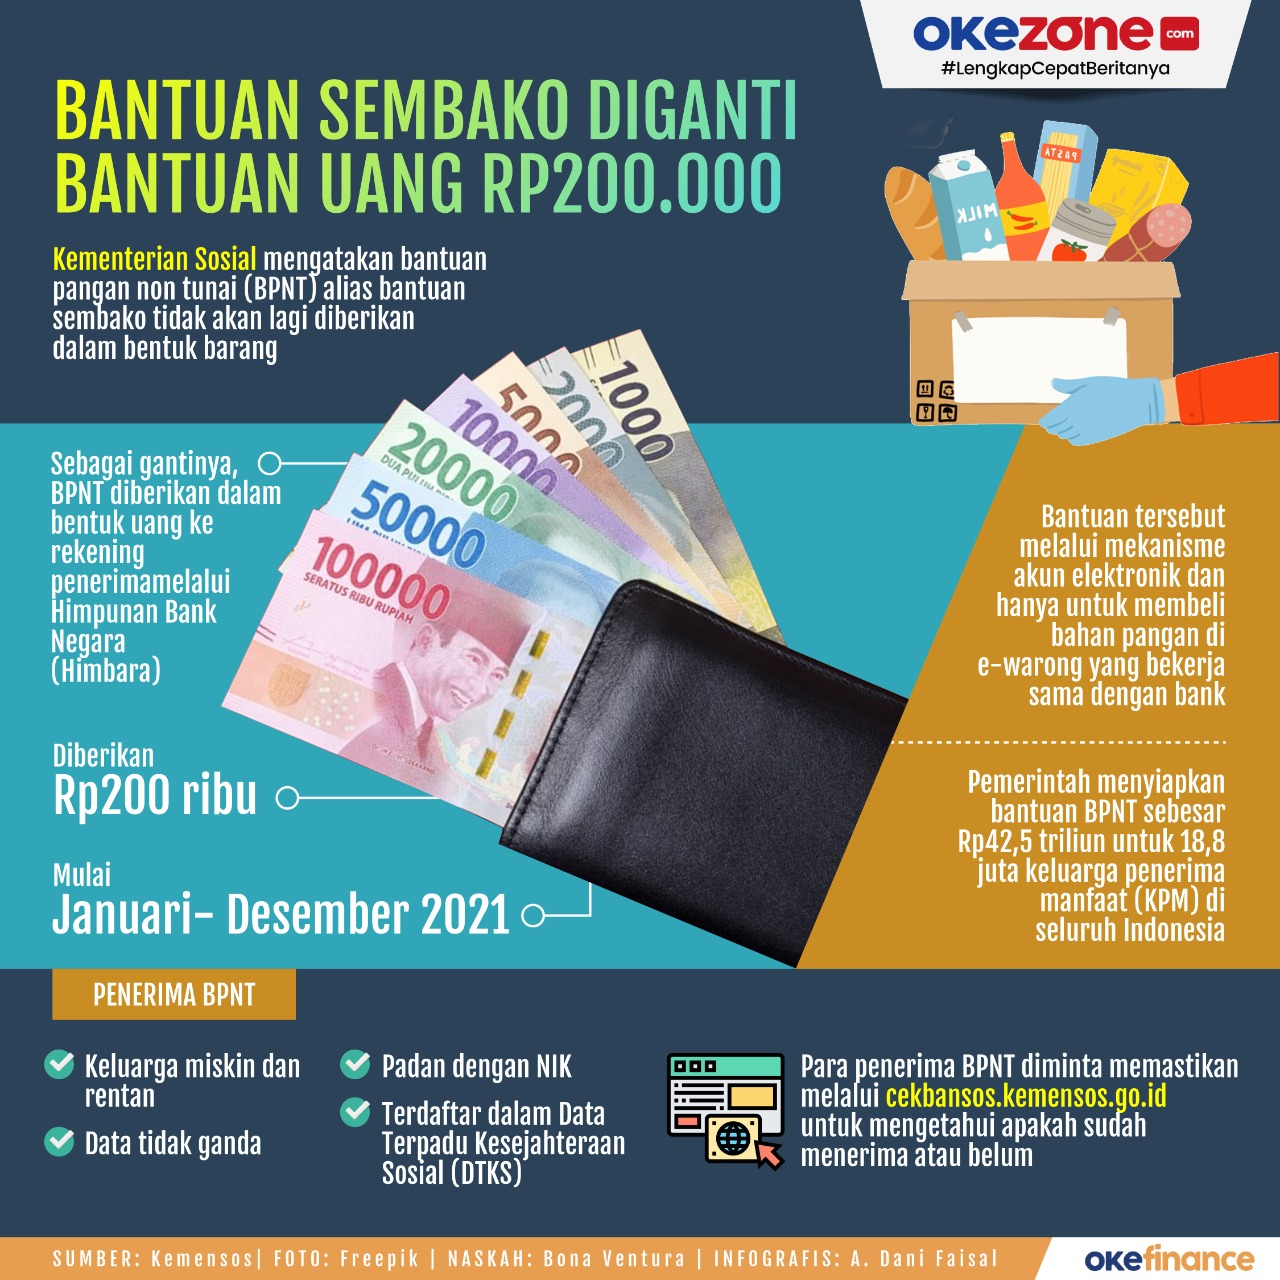 Bantuan Sembako Diganti Bantuan Uang Rp200.000 -